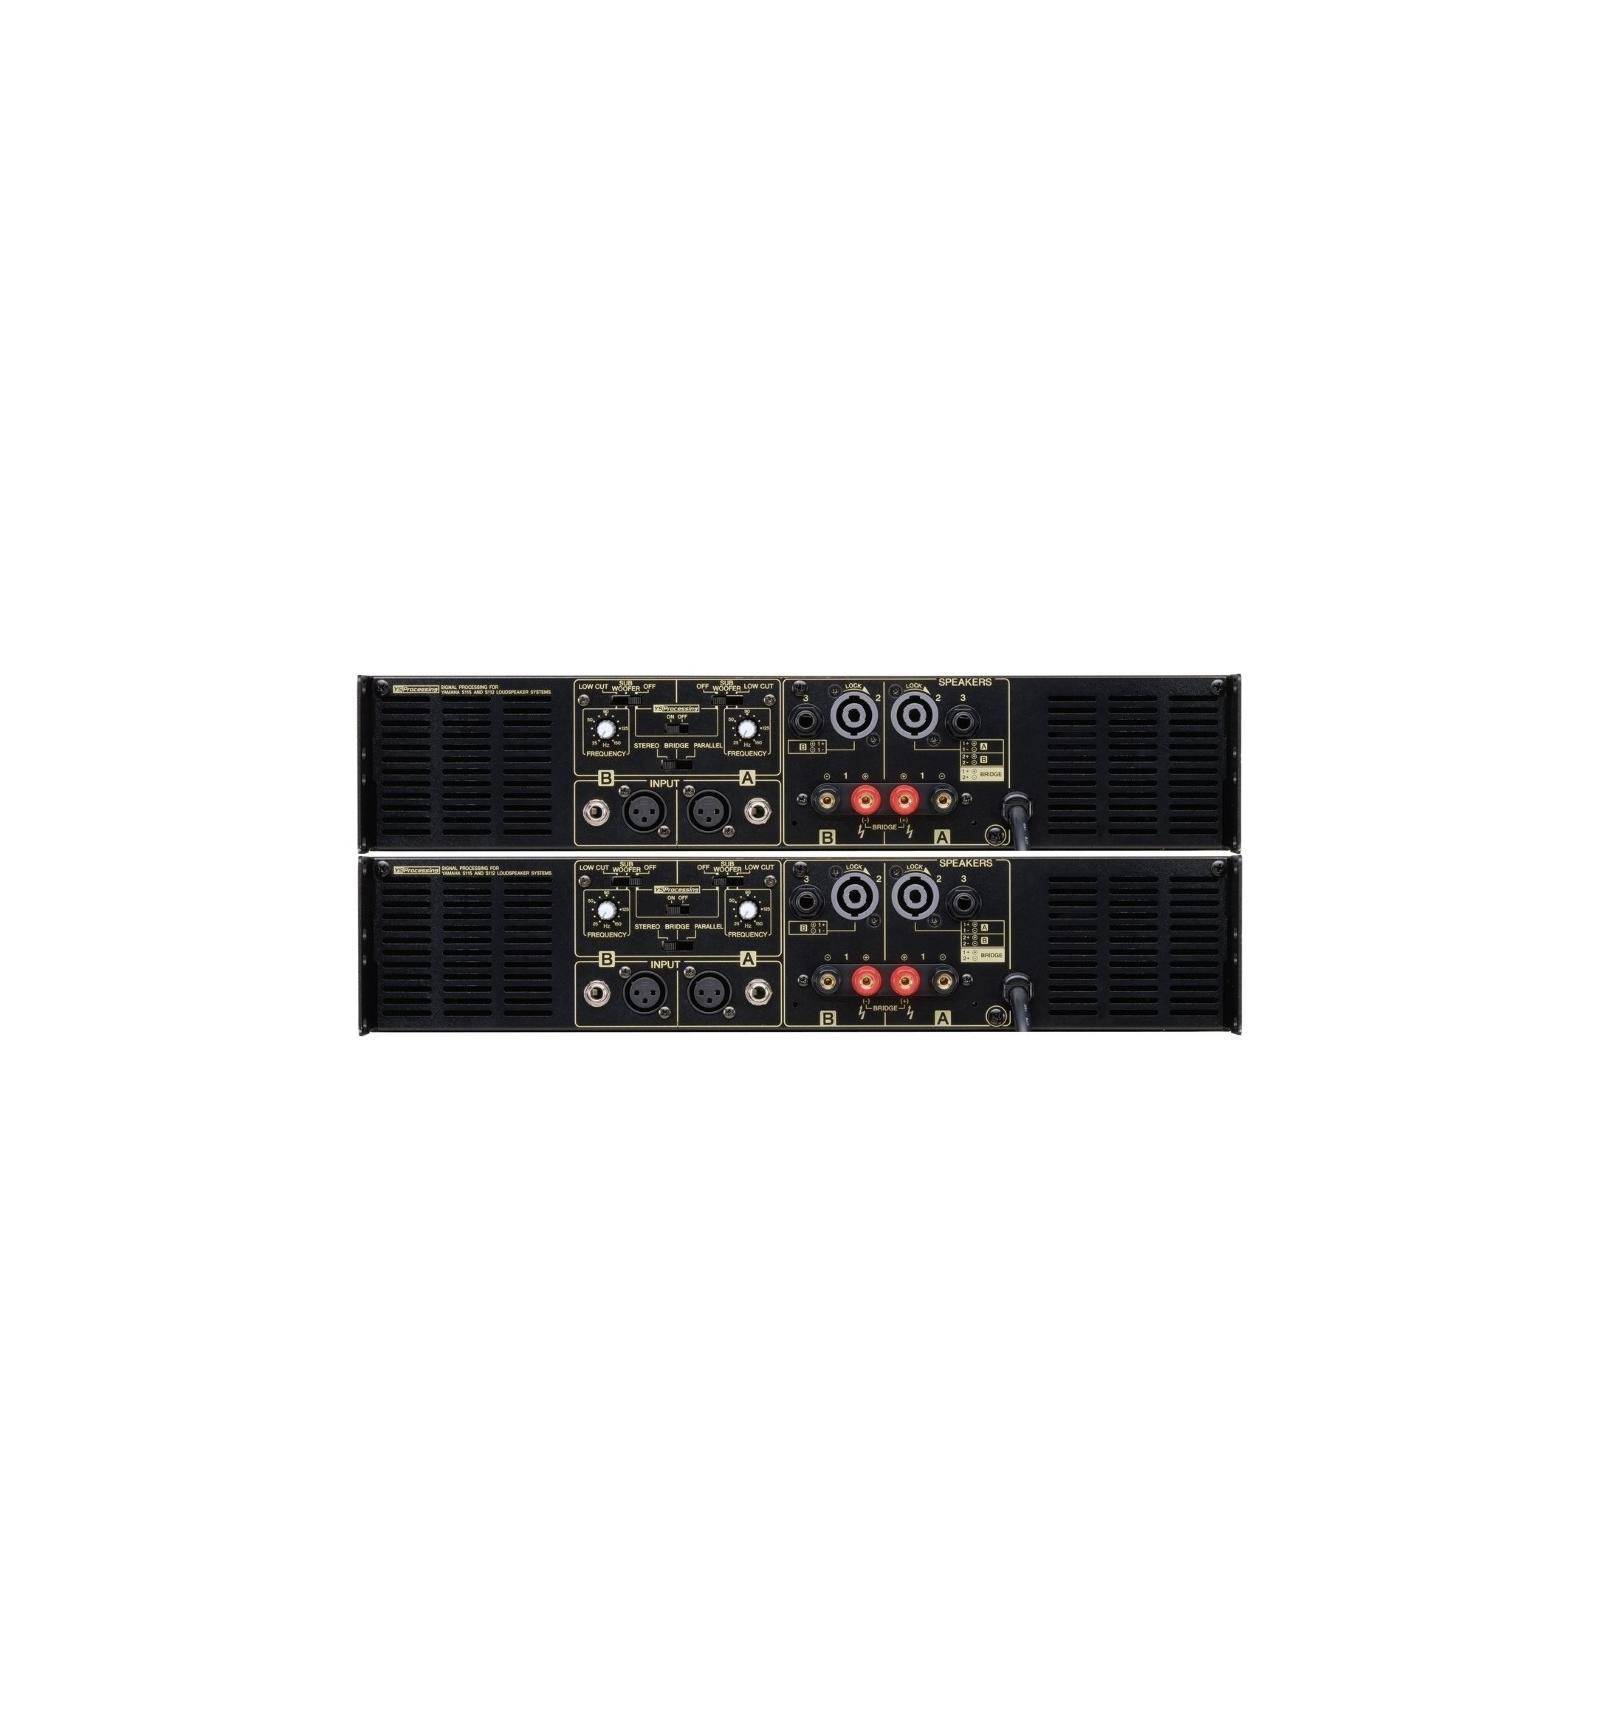 Power Amplifier Yamaha P2500s : yamaha p2500s power amplifier 2 adet camaross audio hifi high detail ~ Hamham.info Haus und Dekorationen